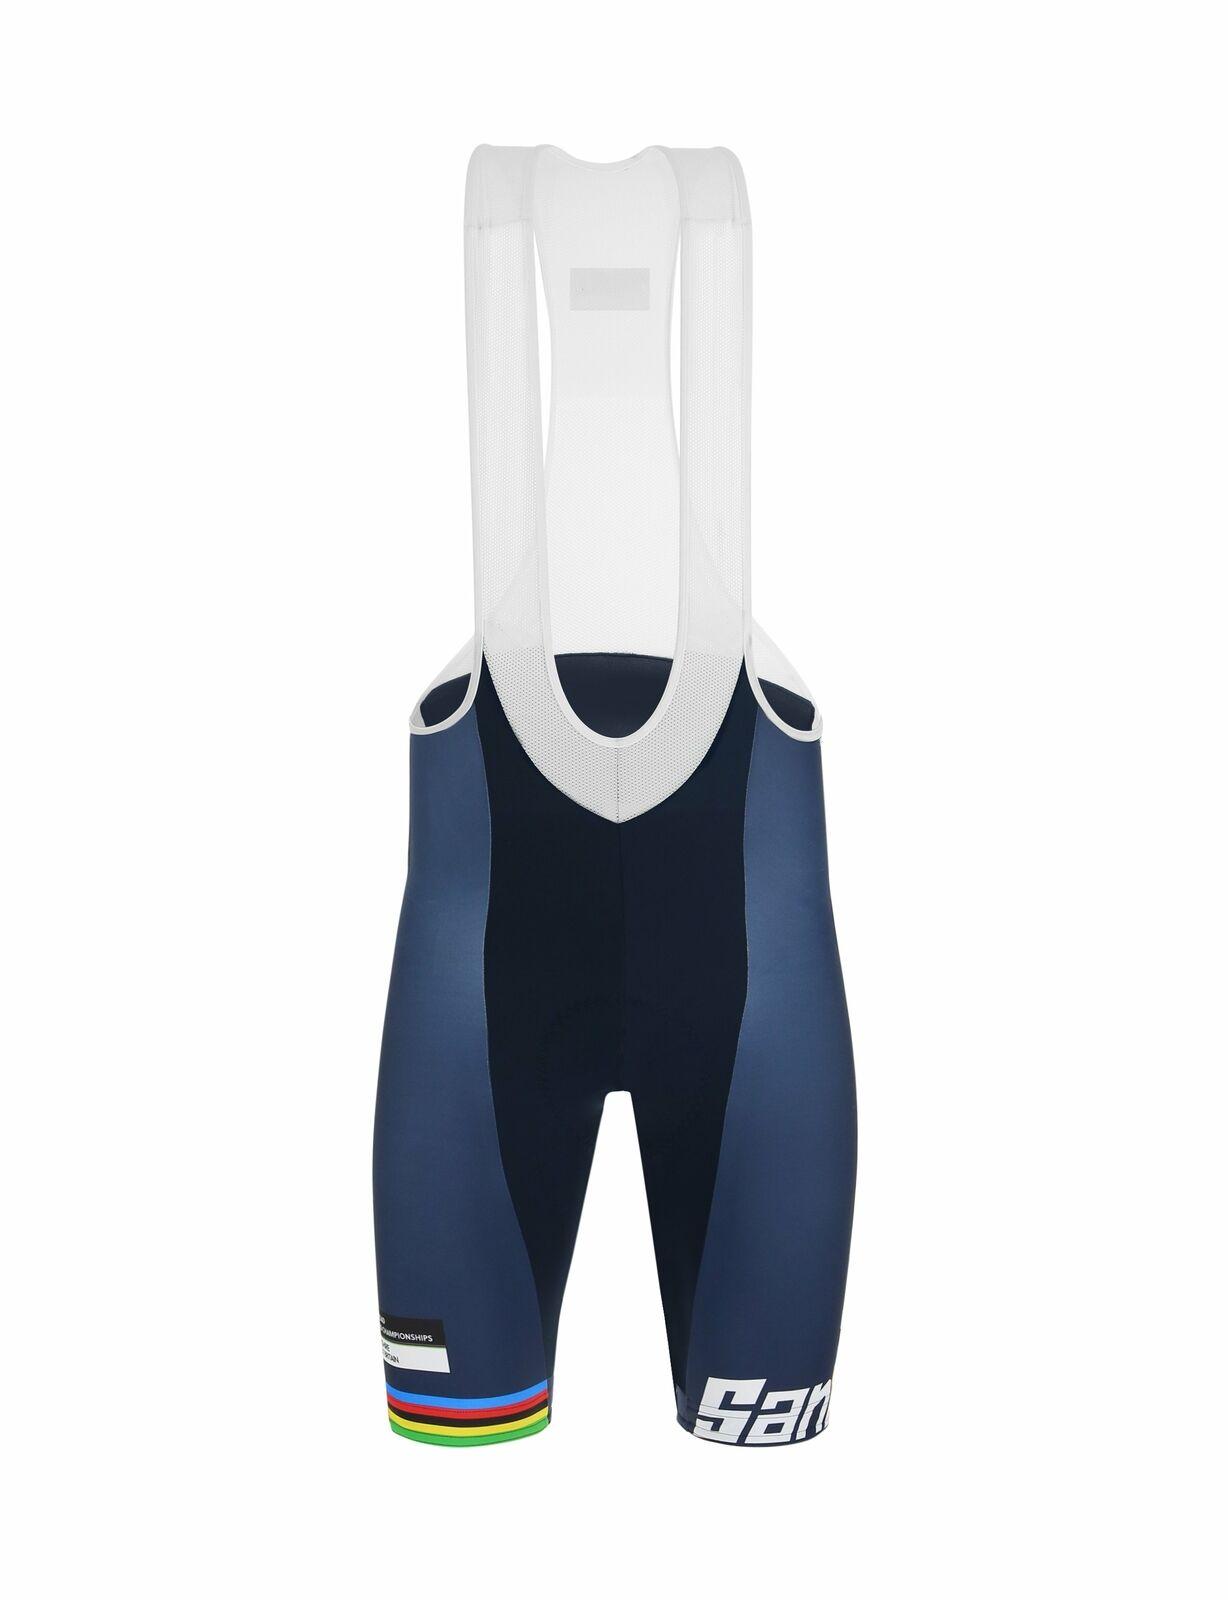 2019 Yorkshire Championships Ciclismo mono Pantalones cortos por World Santini